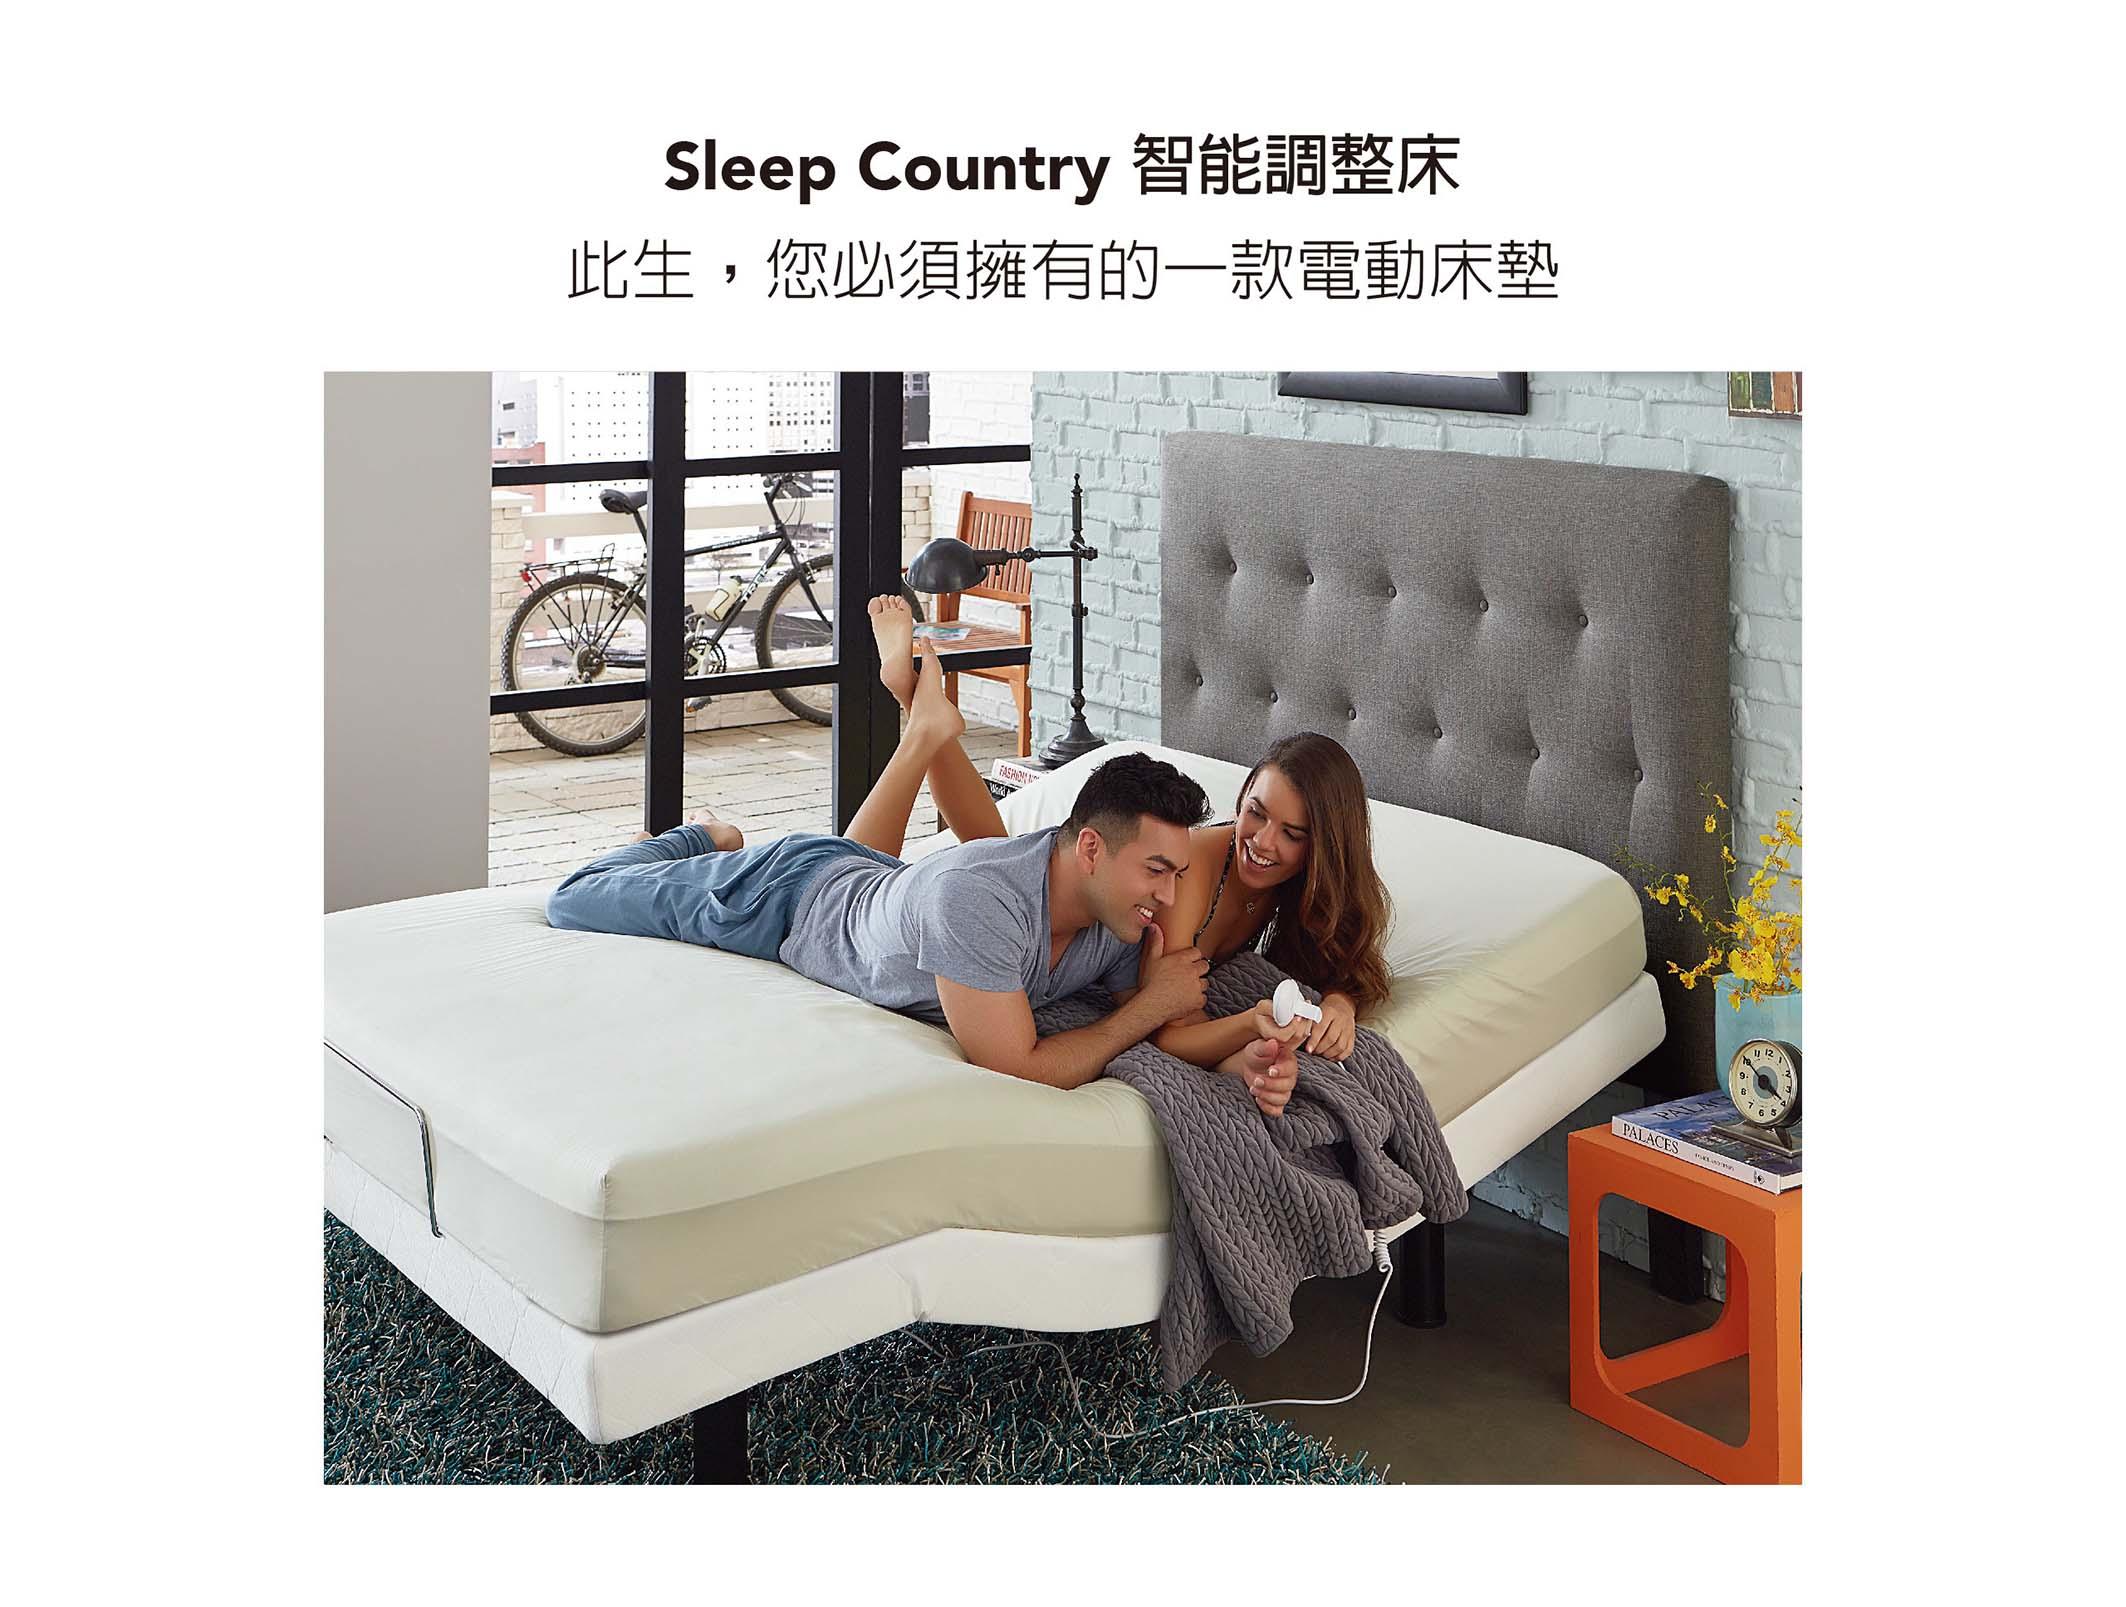 Sleep Country 智能調整床|SMART-303|睡眠王國集團